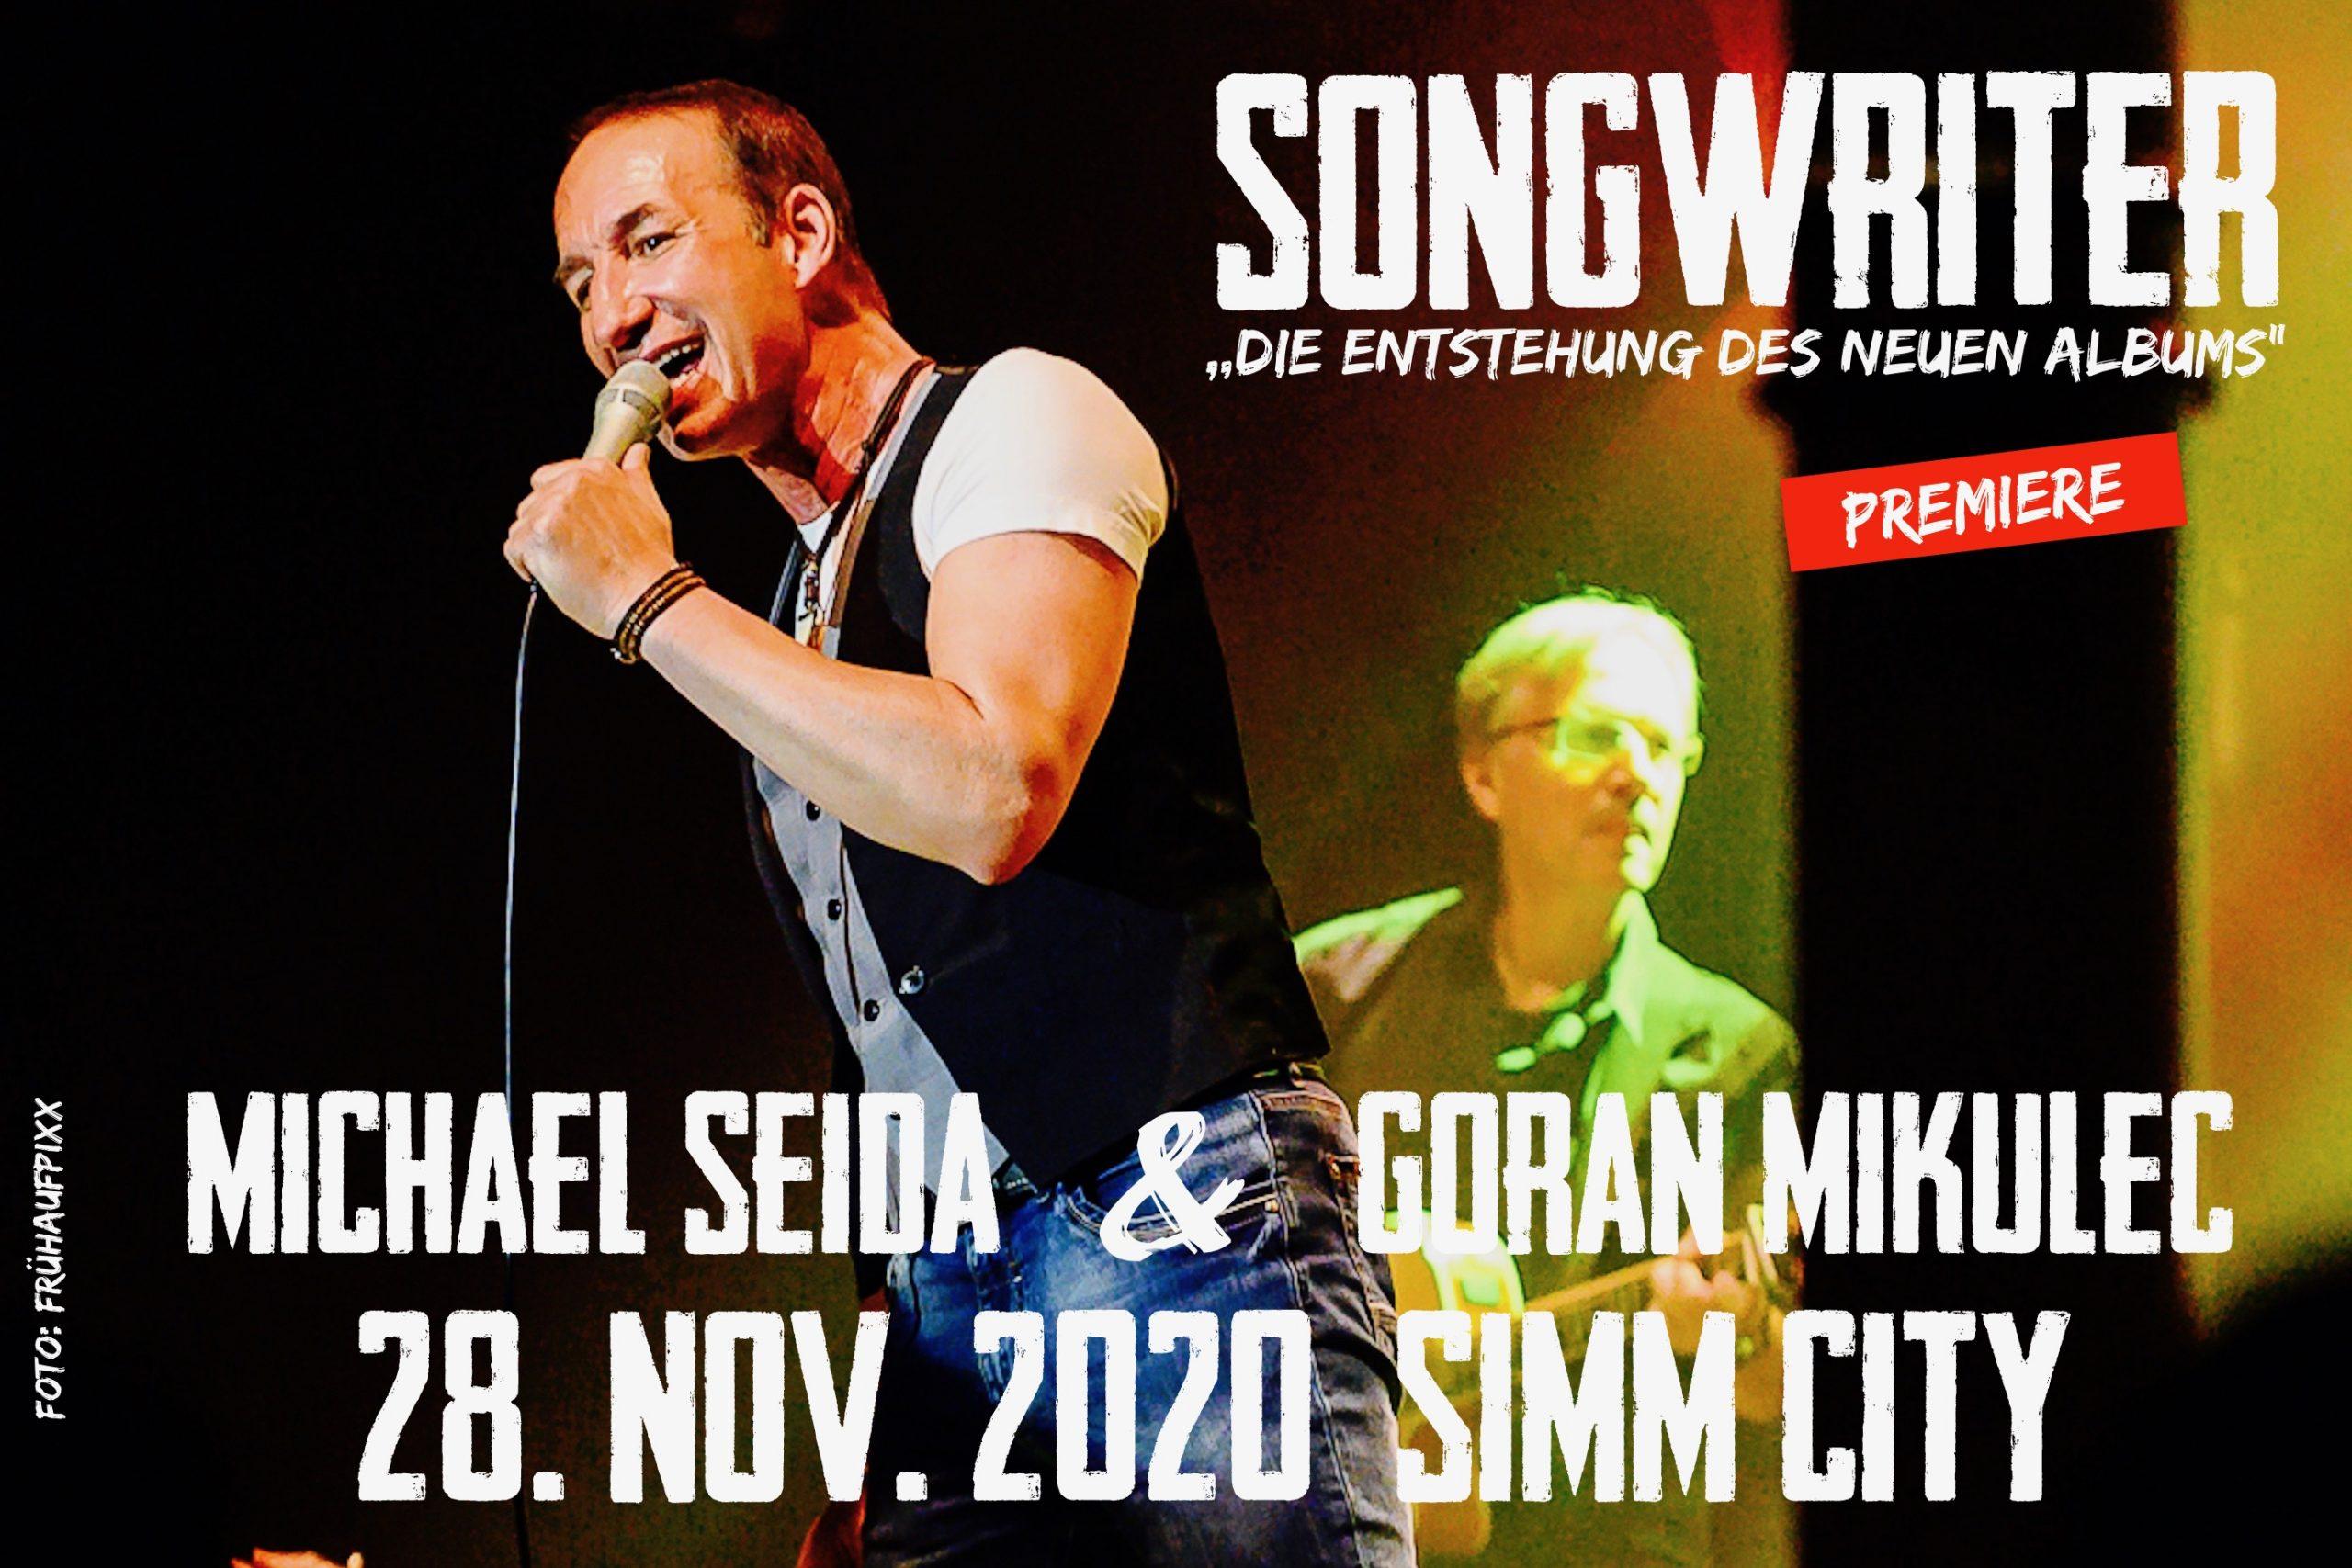 Michael Seida & Goran Mikulec am 28. November 2020 @ Simm City.